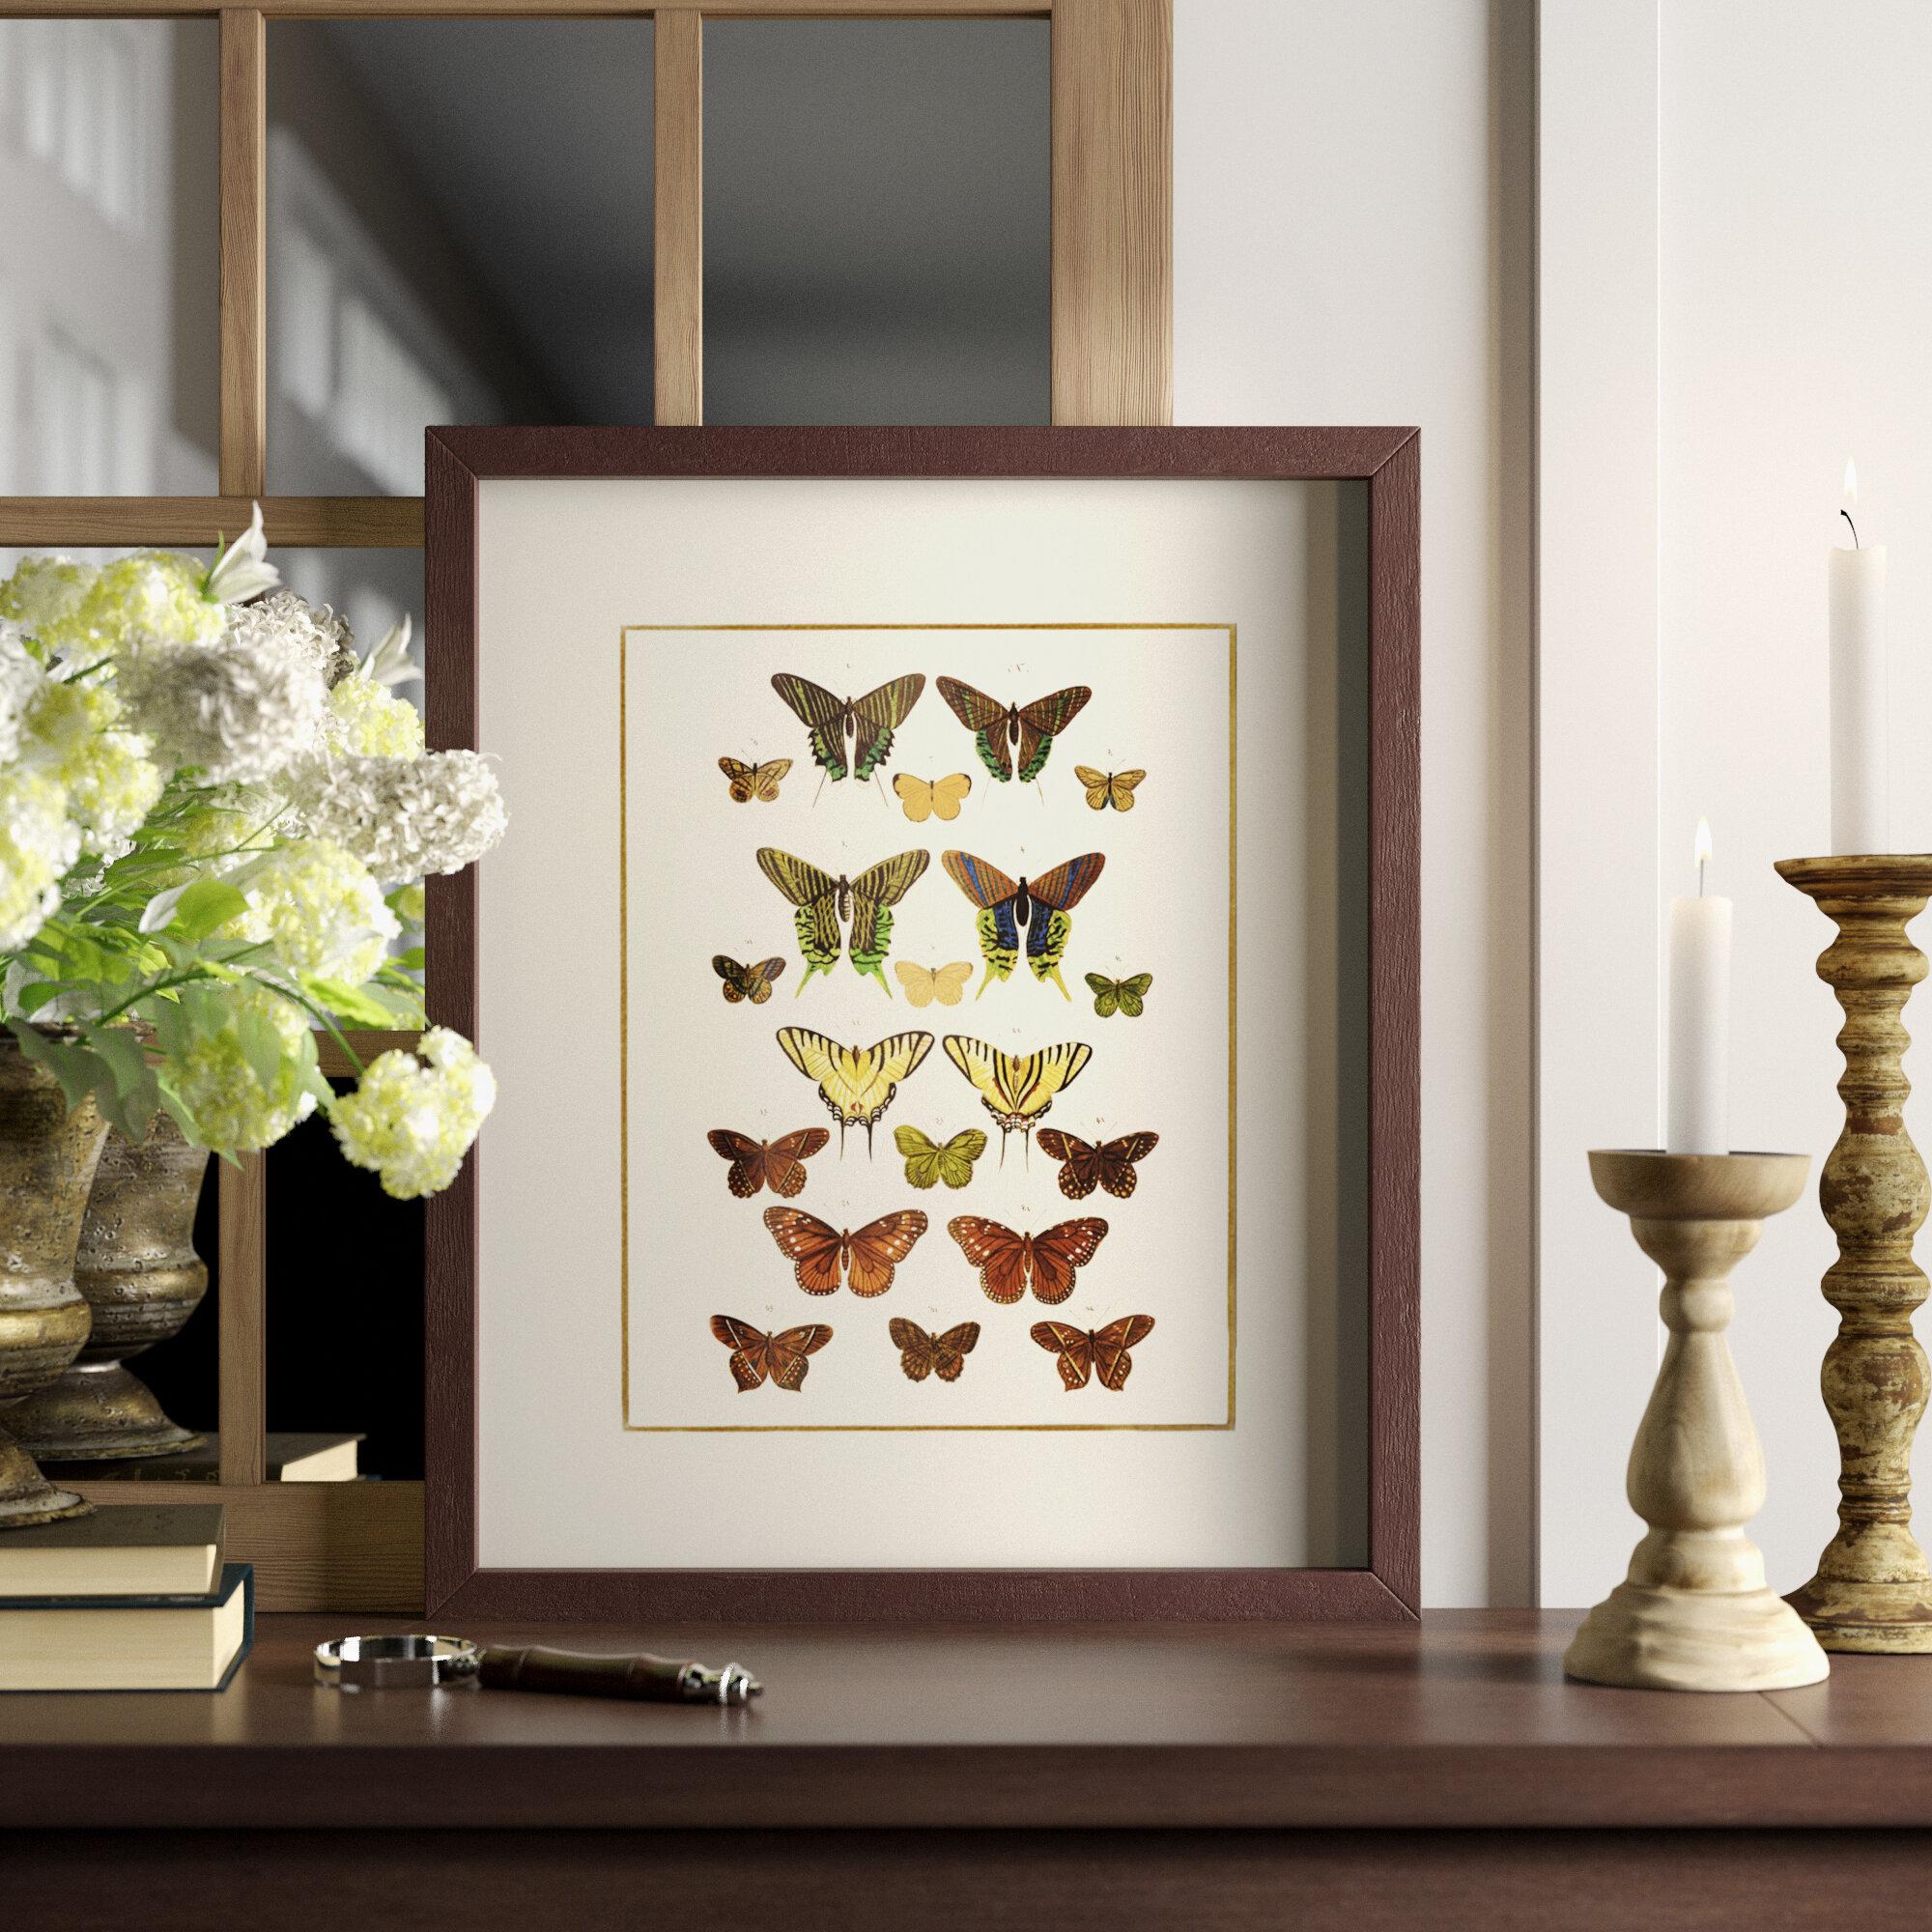 Papillon Picture Frame Graphic Art Print On Wood Reviews Birch Lane